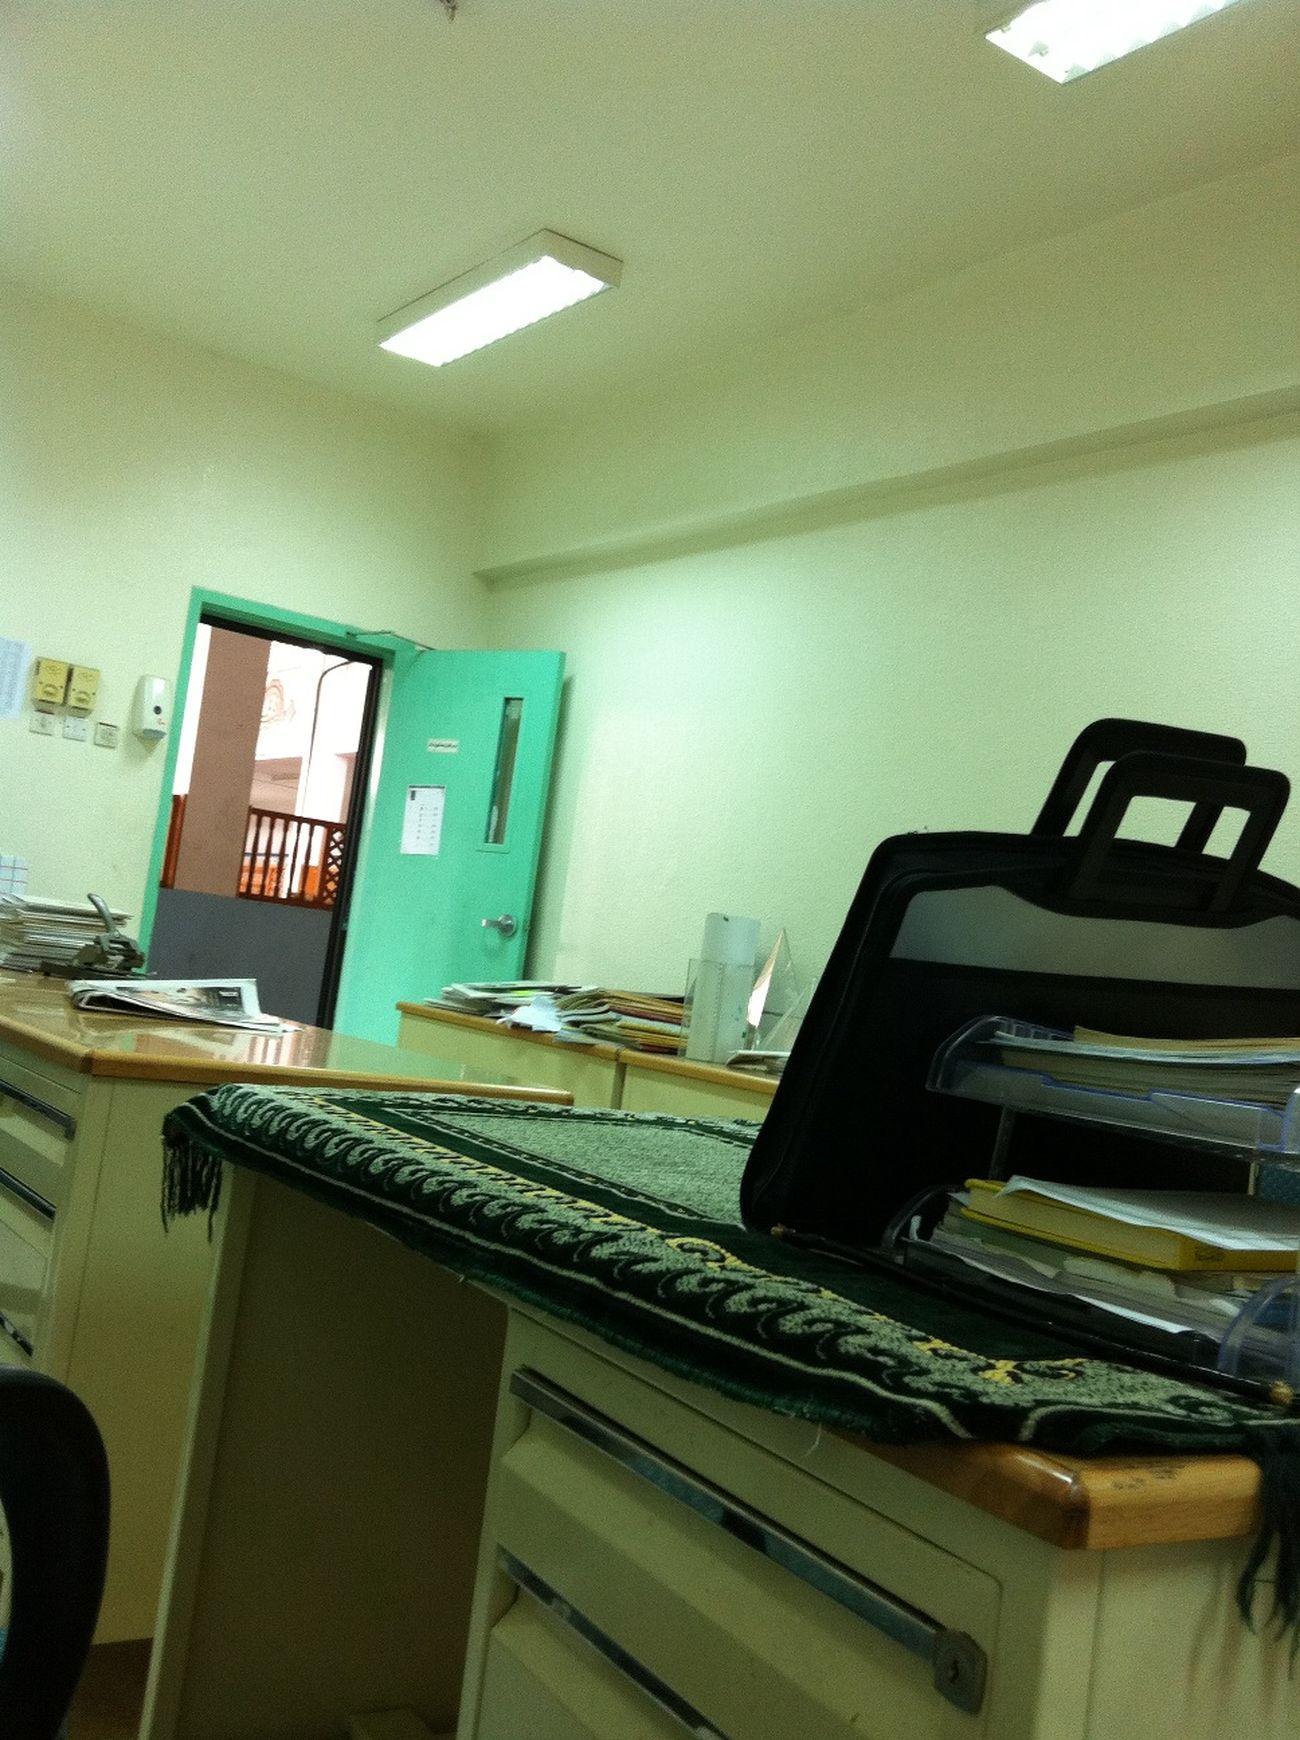 at Effat University